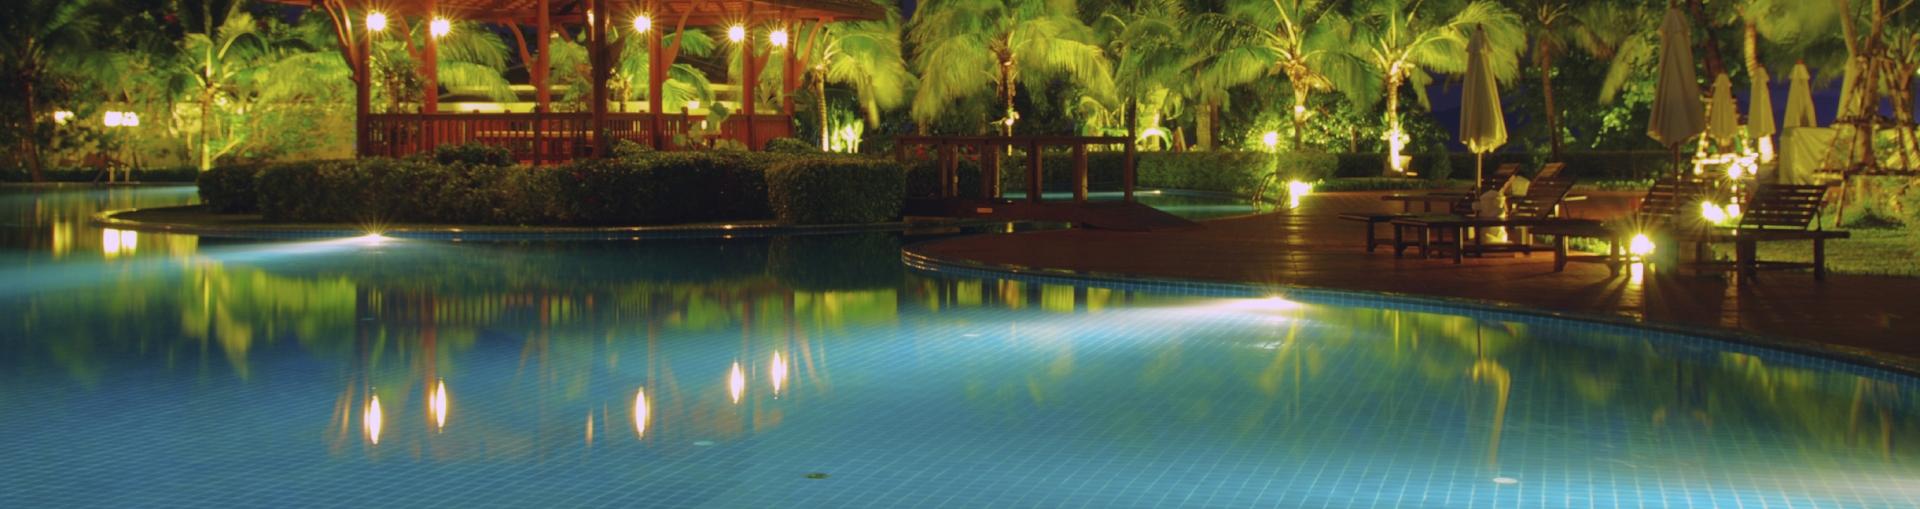 Türkei Pool